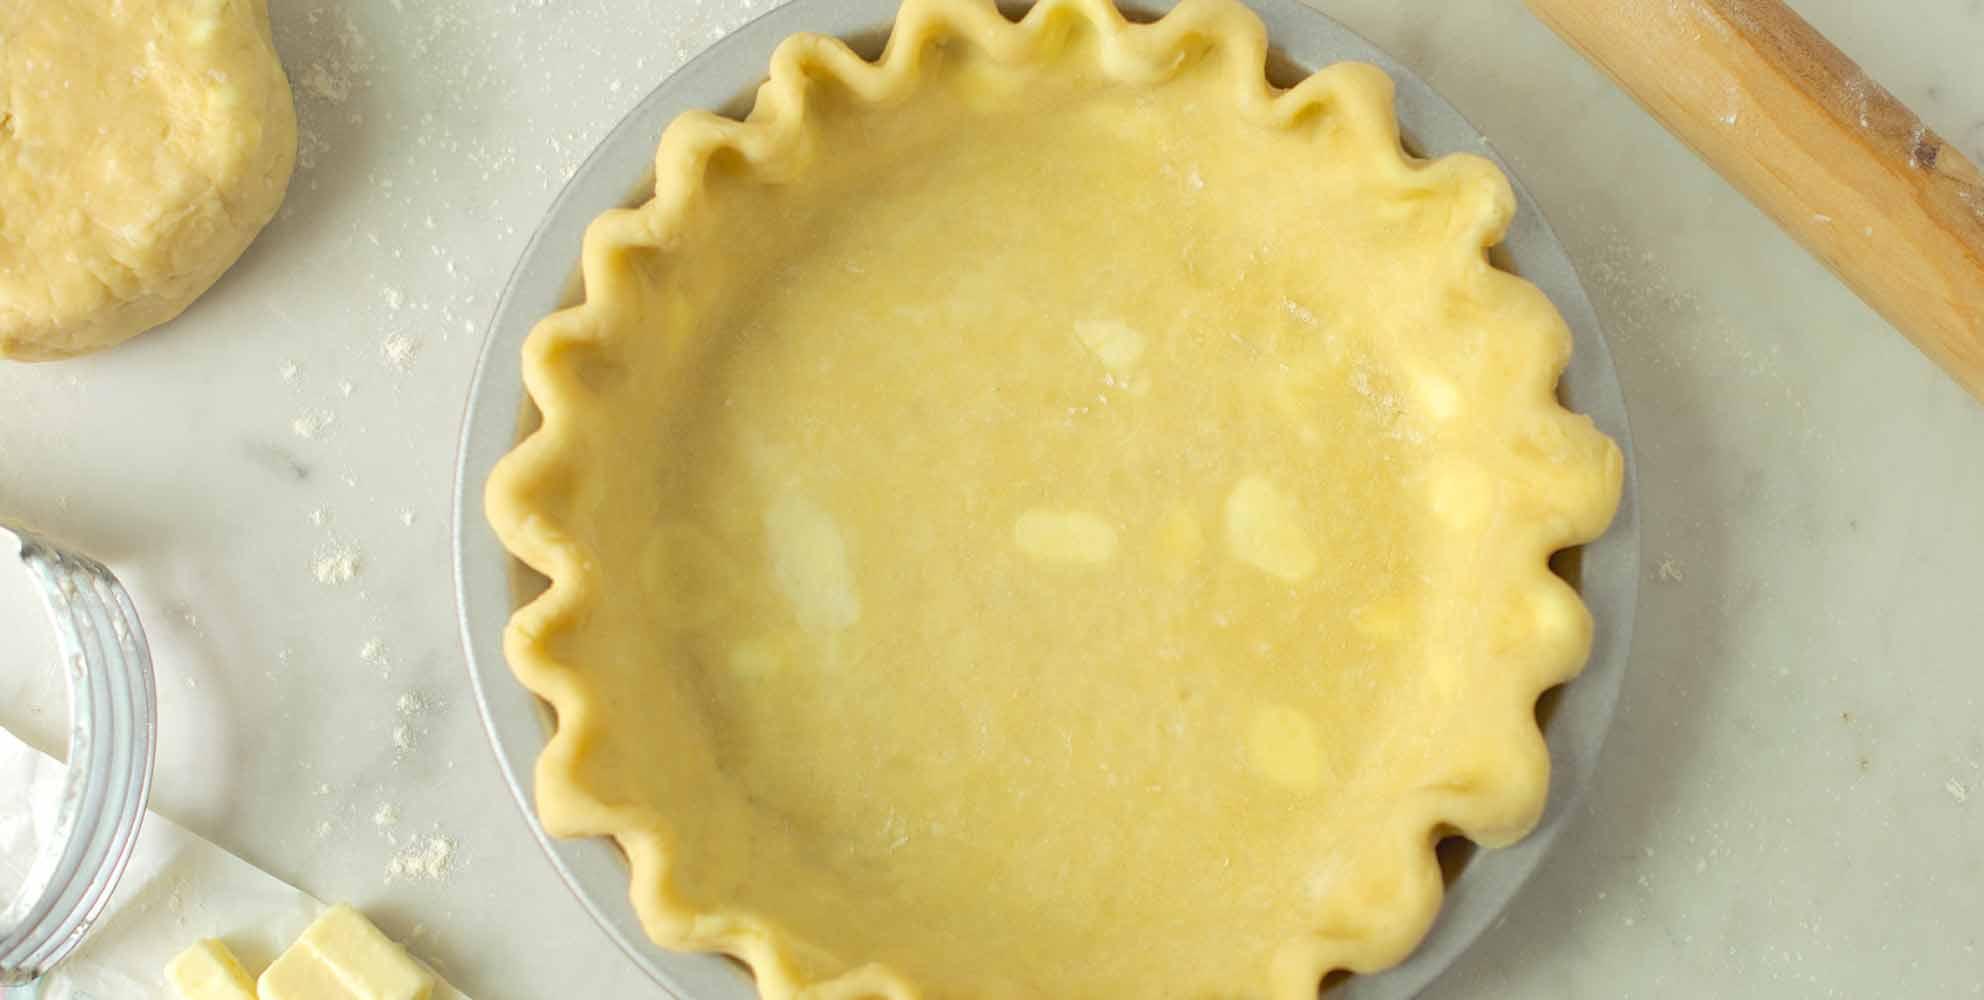 Steam clipart pie crust Guide Find Arthur King dream